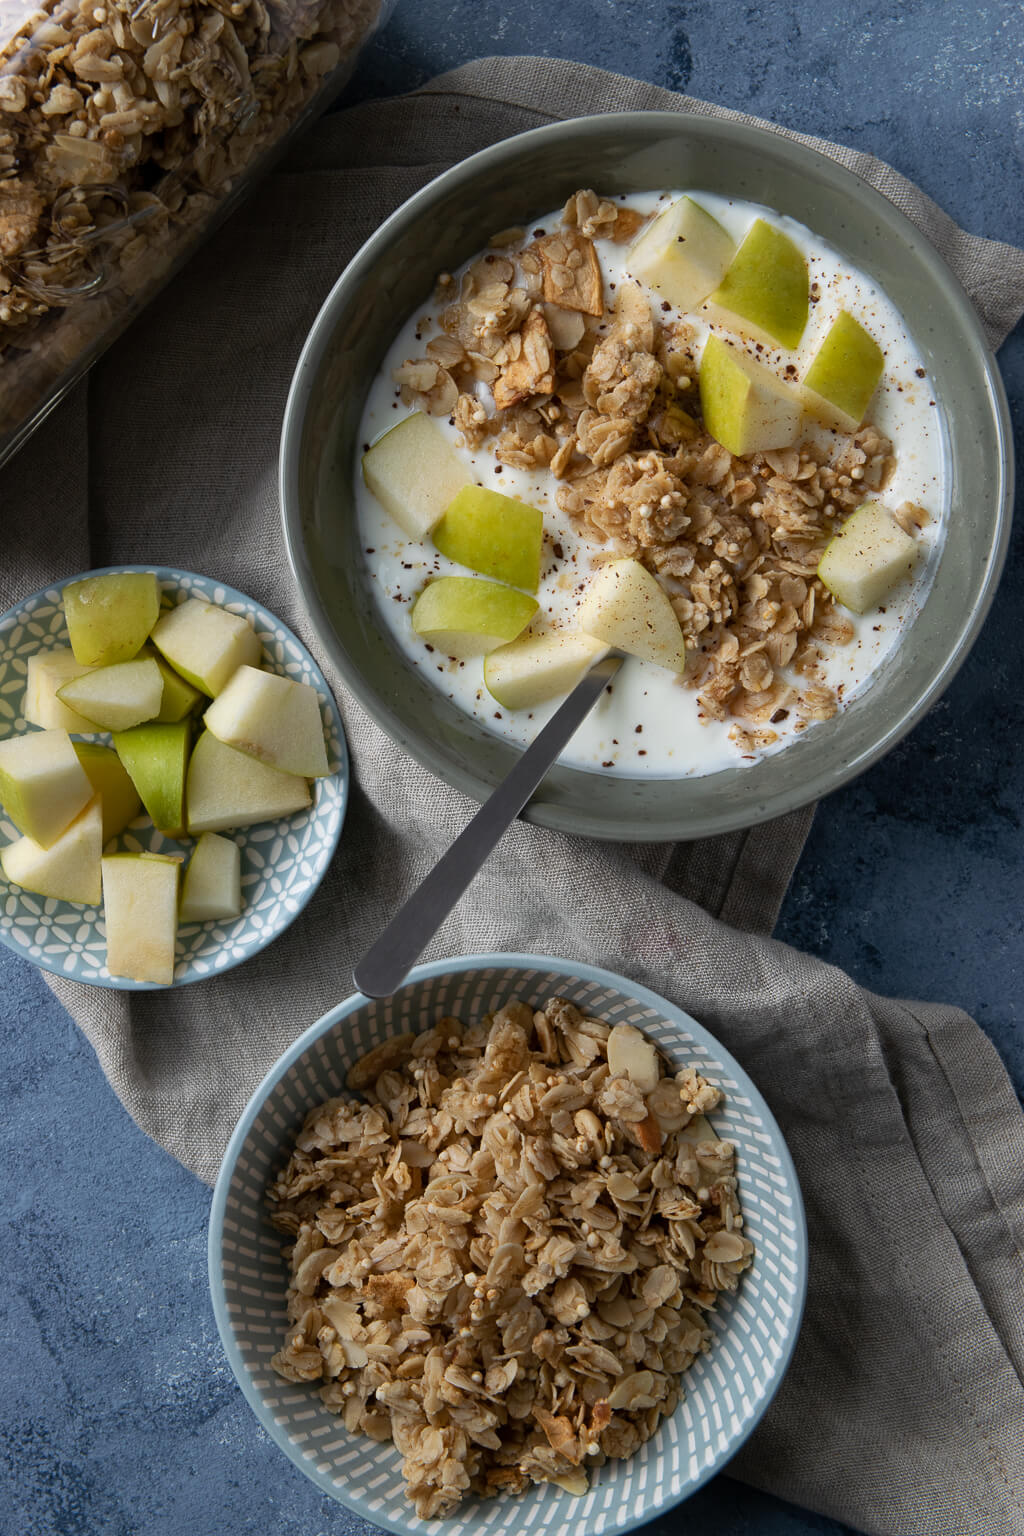 Müsli mit Apfel und Joghurt zum Frühstück